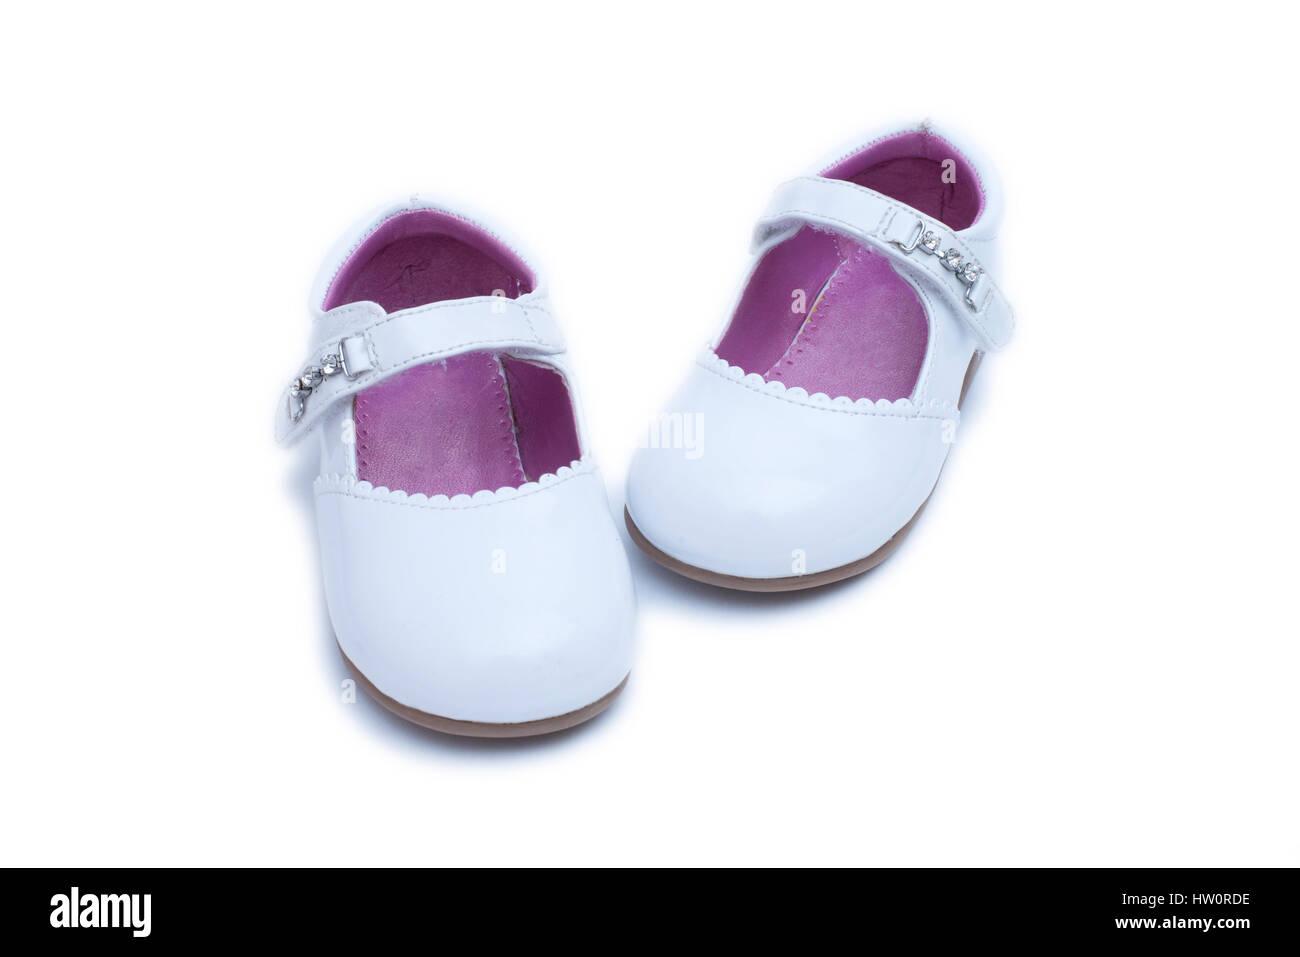 862fe2eacb0a4 Chaussures femme blanc. Chaussures enfants isolé sur fond blanc Photo Stock